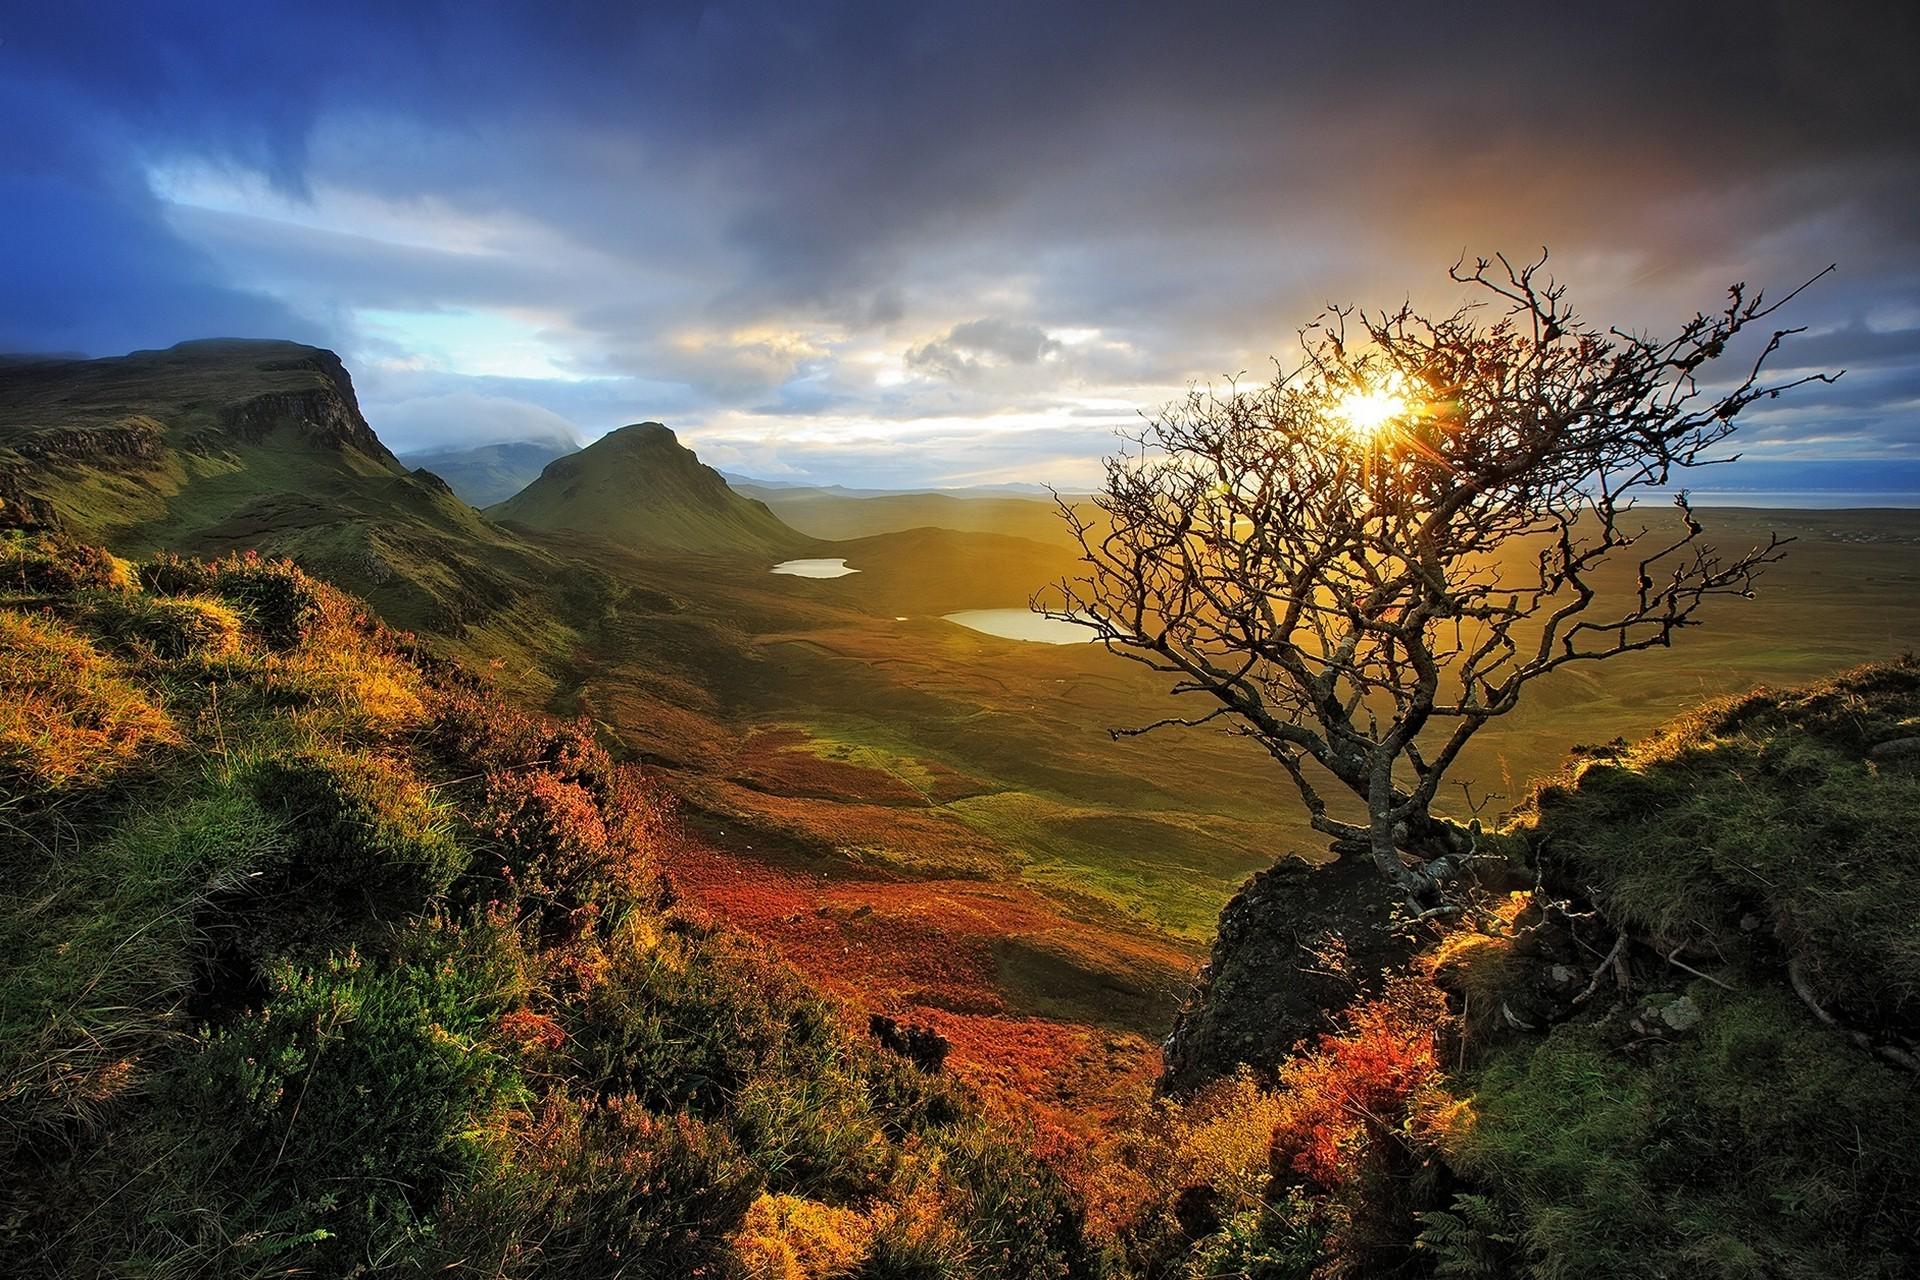 Colorado Fall Desktop Wallpaper Nature Landscape Skye Scotland Sunrise Dead Trees